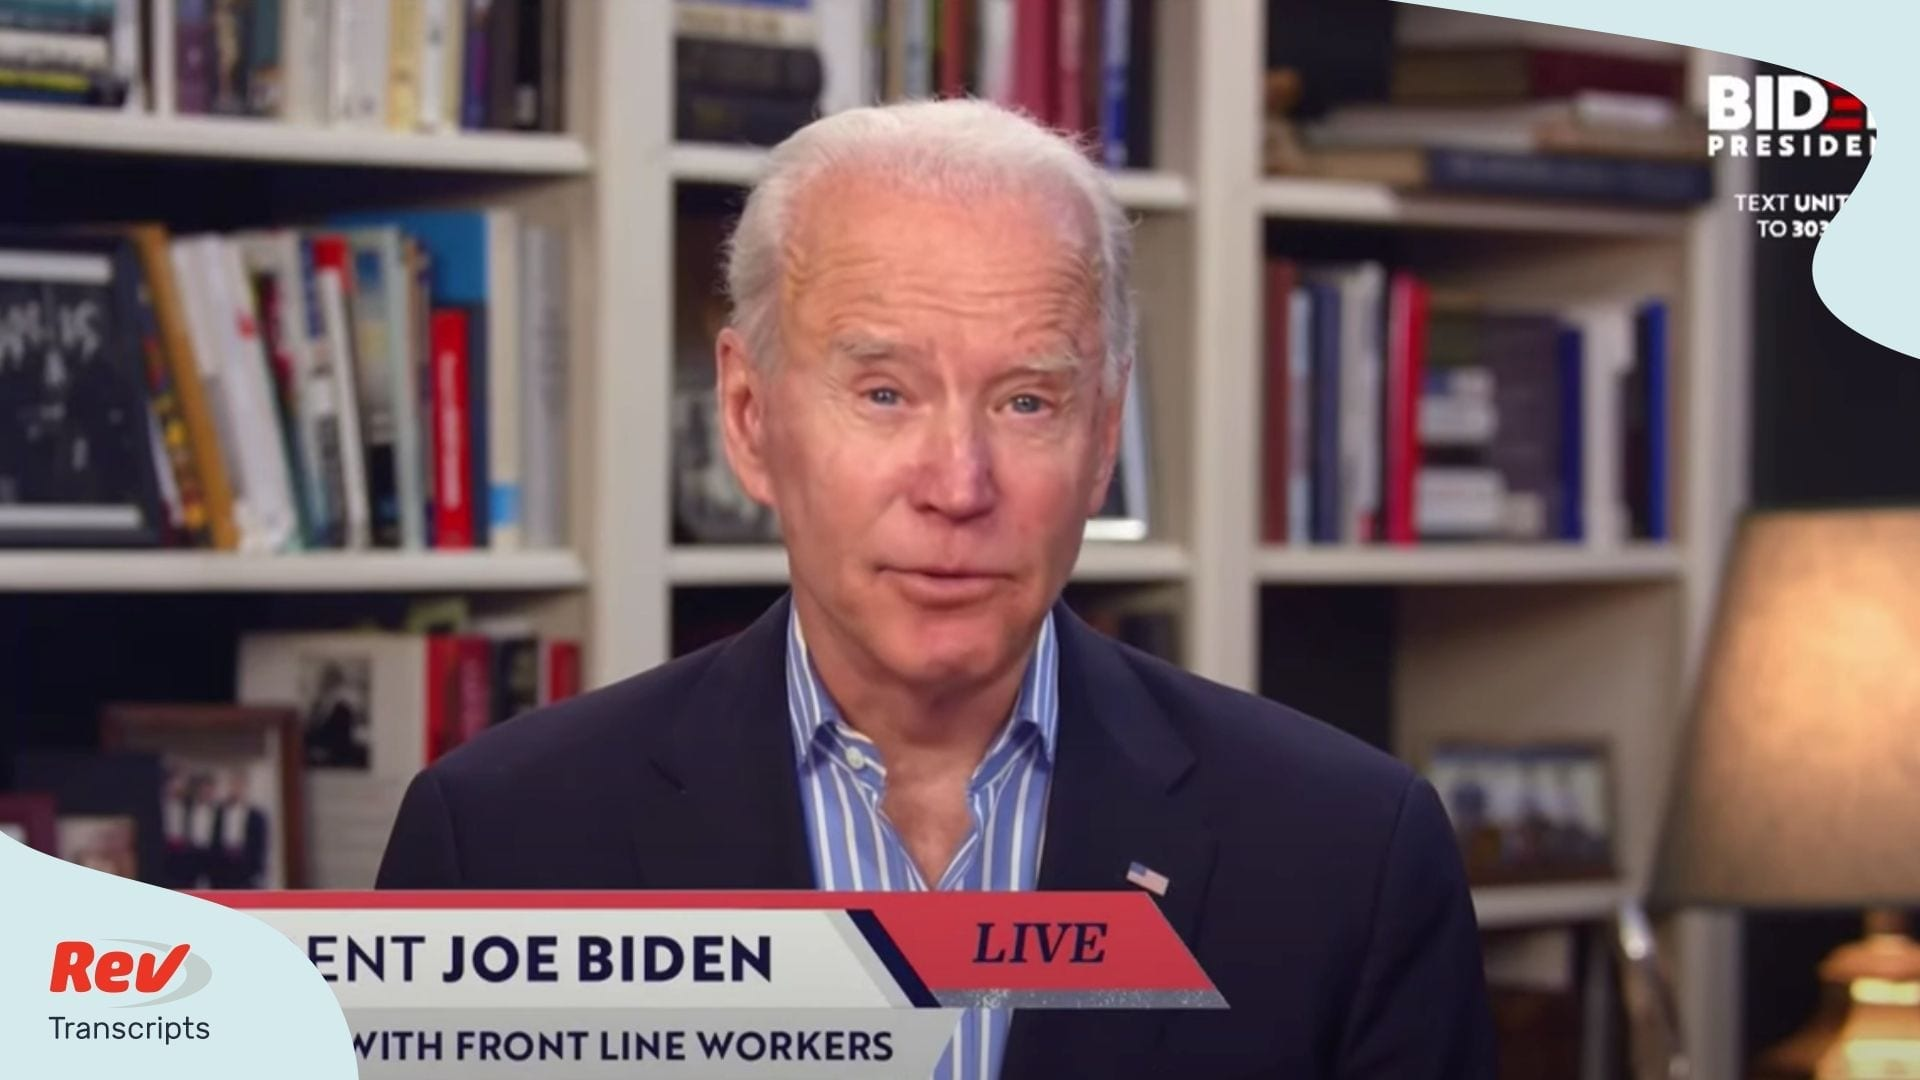 Joe Biden Virtual Town Hall transcript April 15